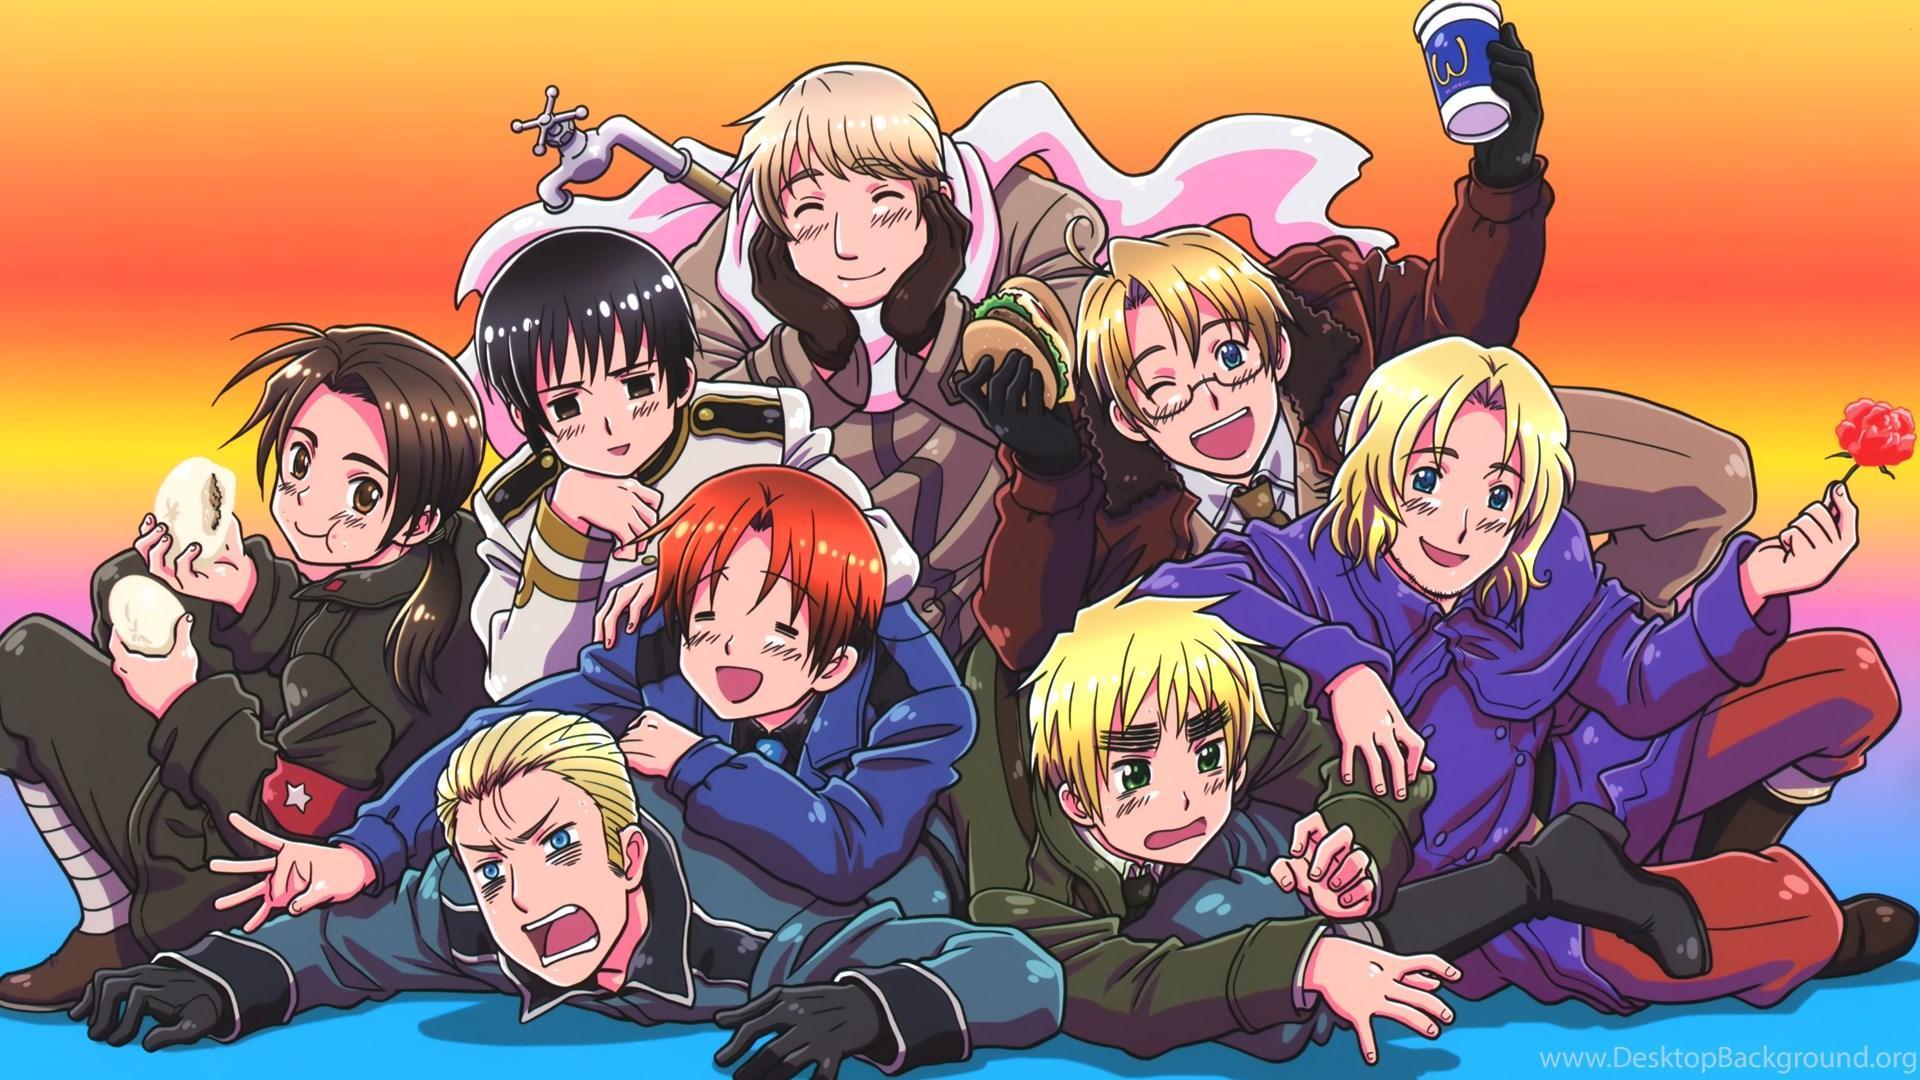 Gijinka anime about countries, Hetalia: Axis of Power